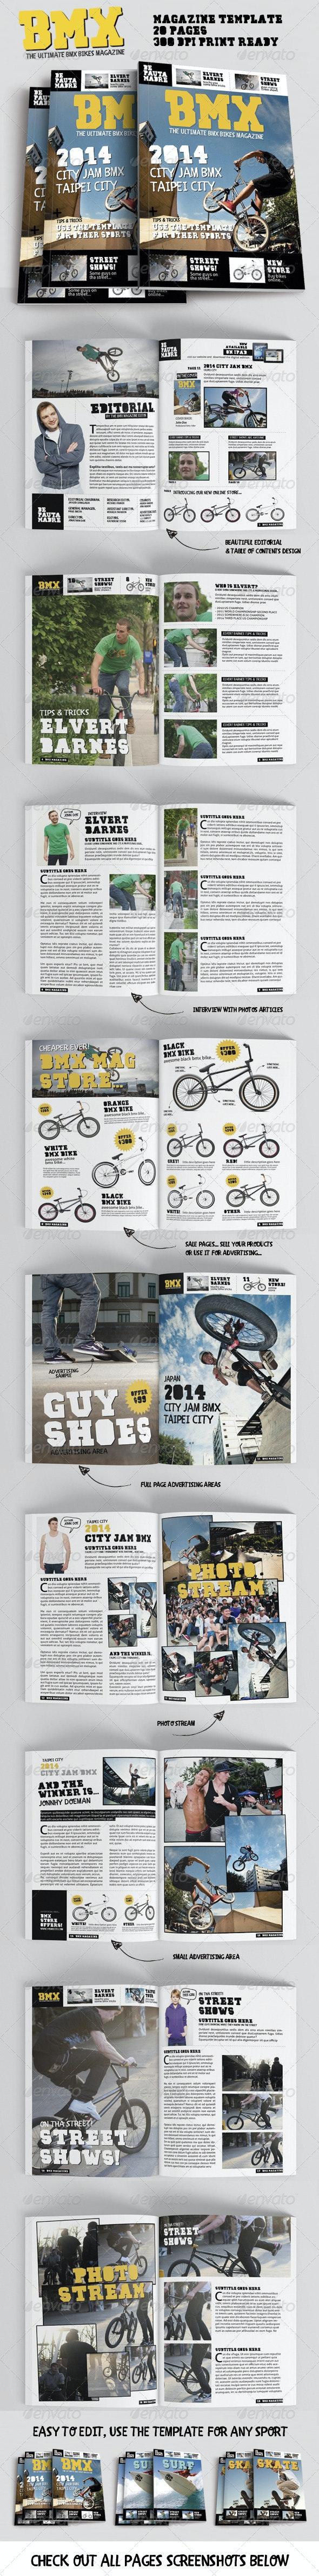 Bmx Bikes Sports Magazine Template for Print - Magazines Print Templates